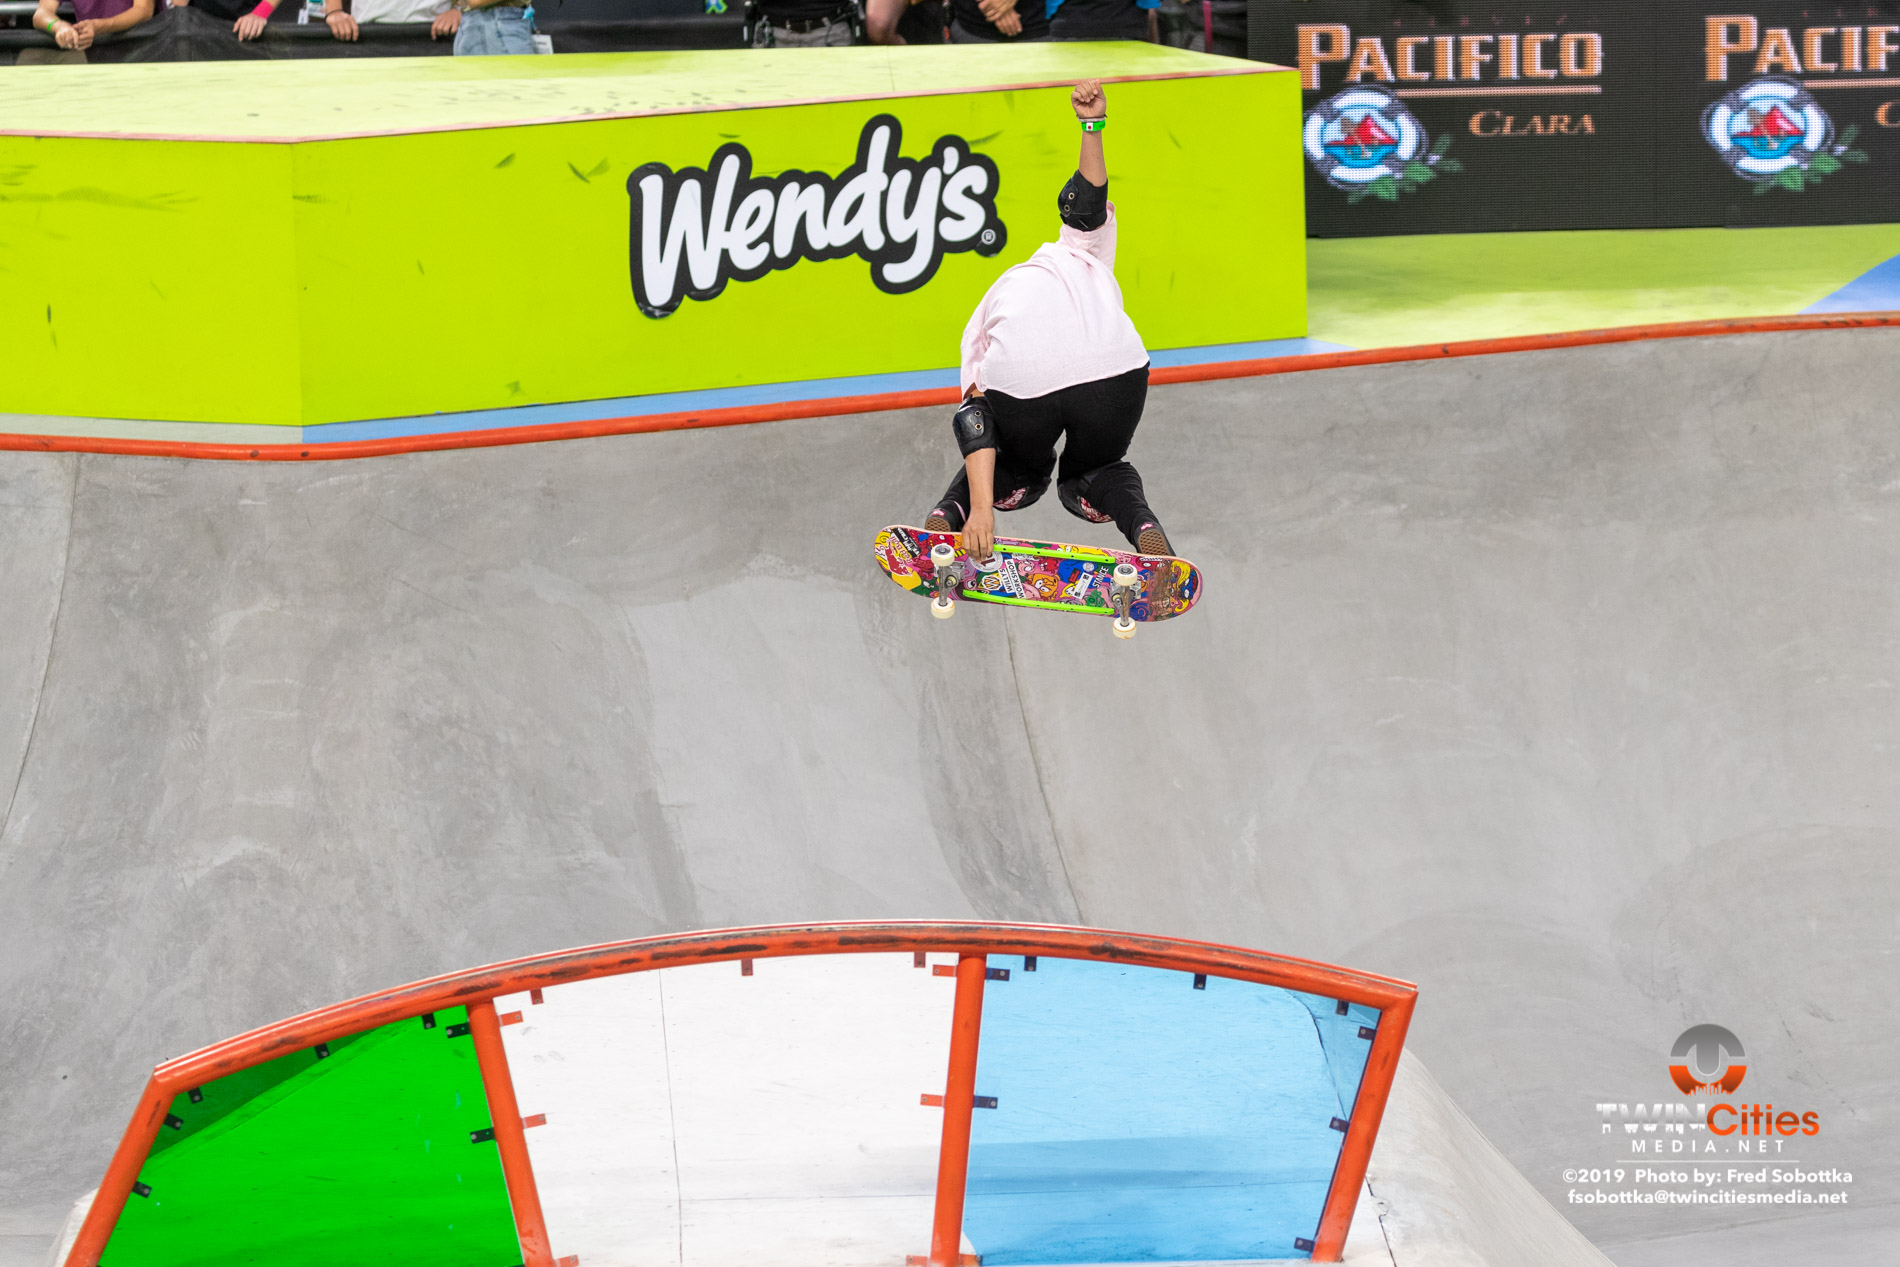 Womens-Skateboard-Park-01